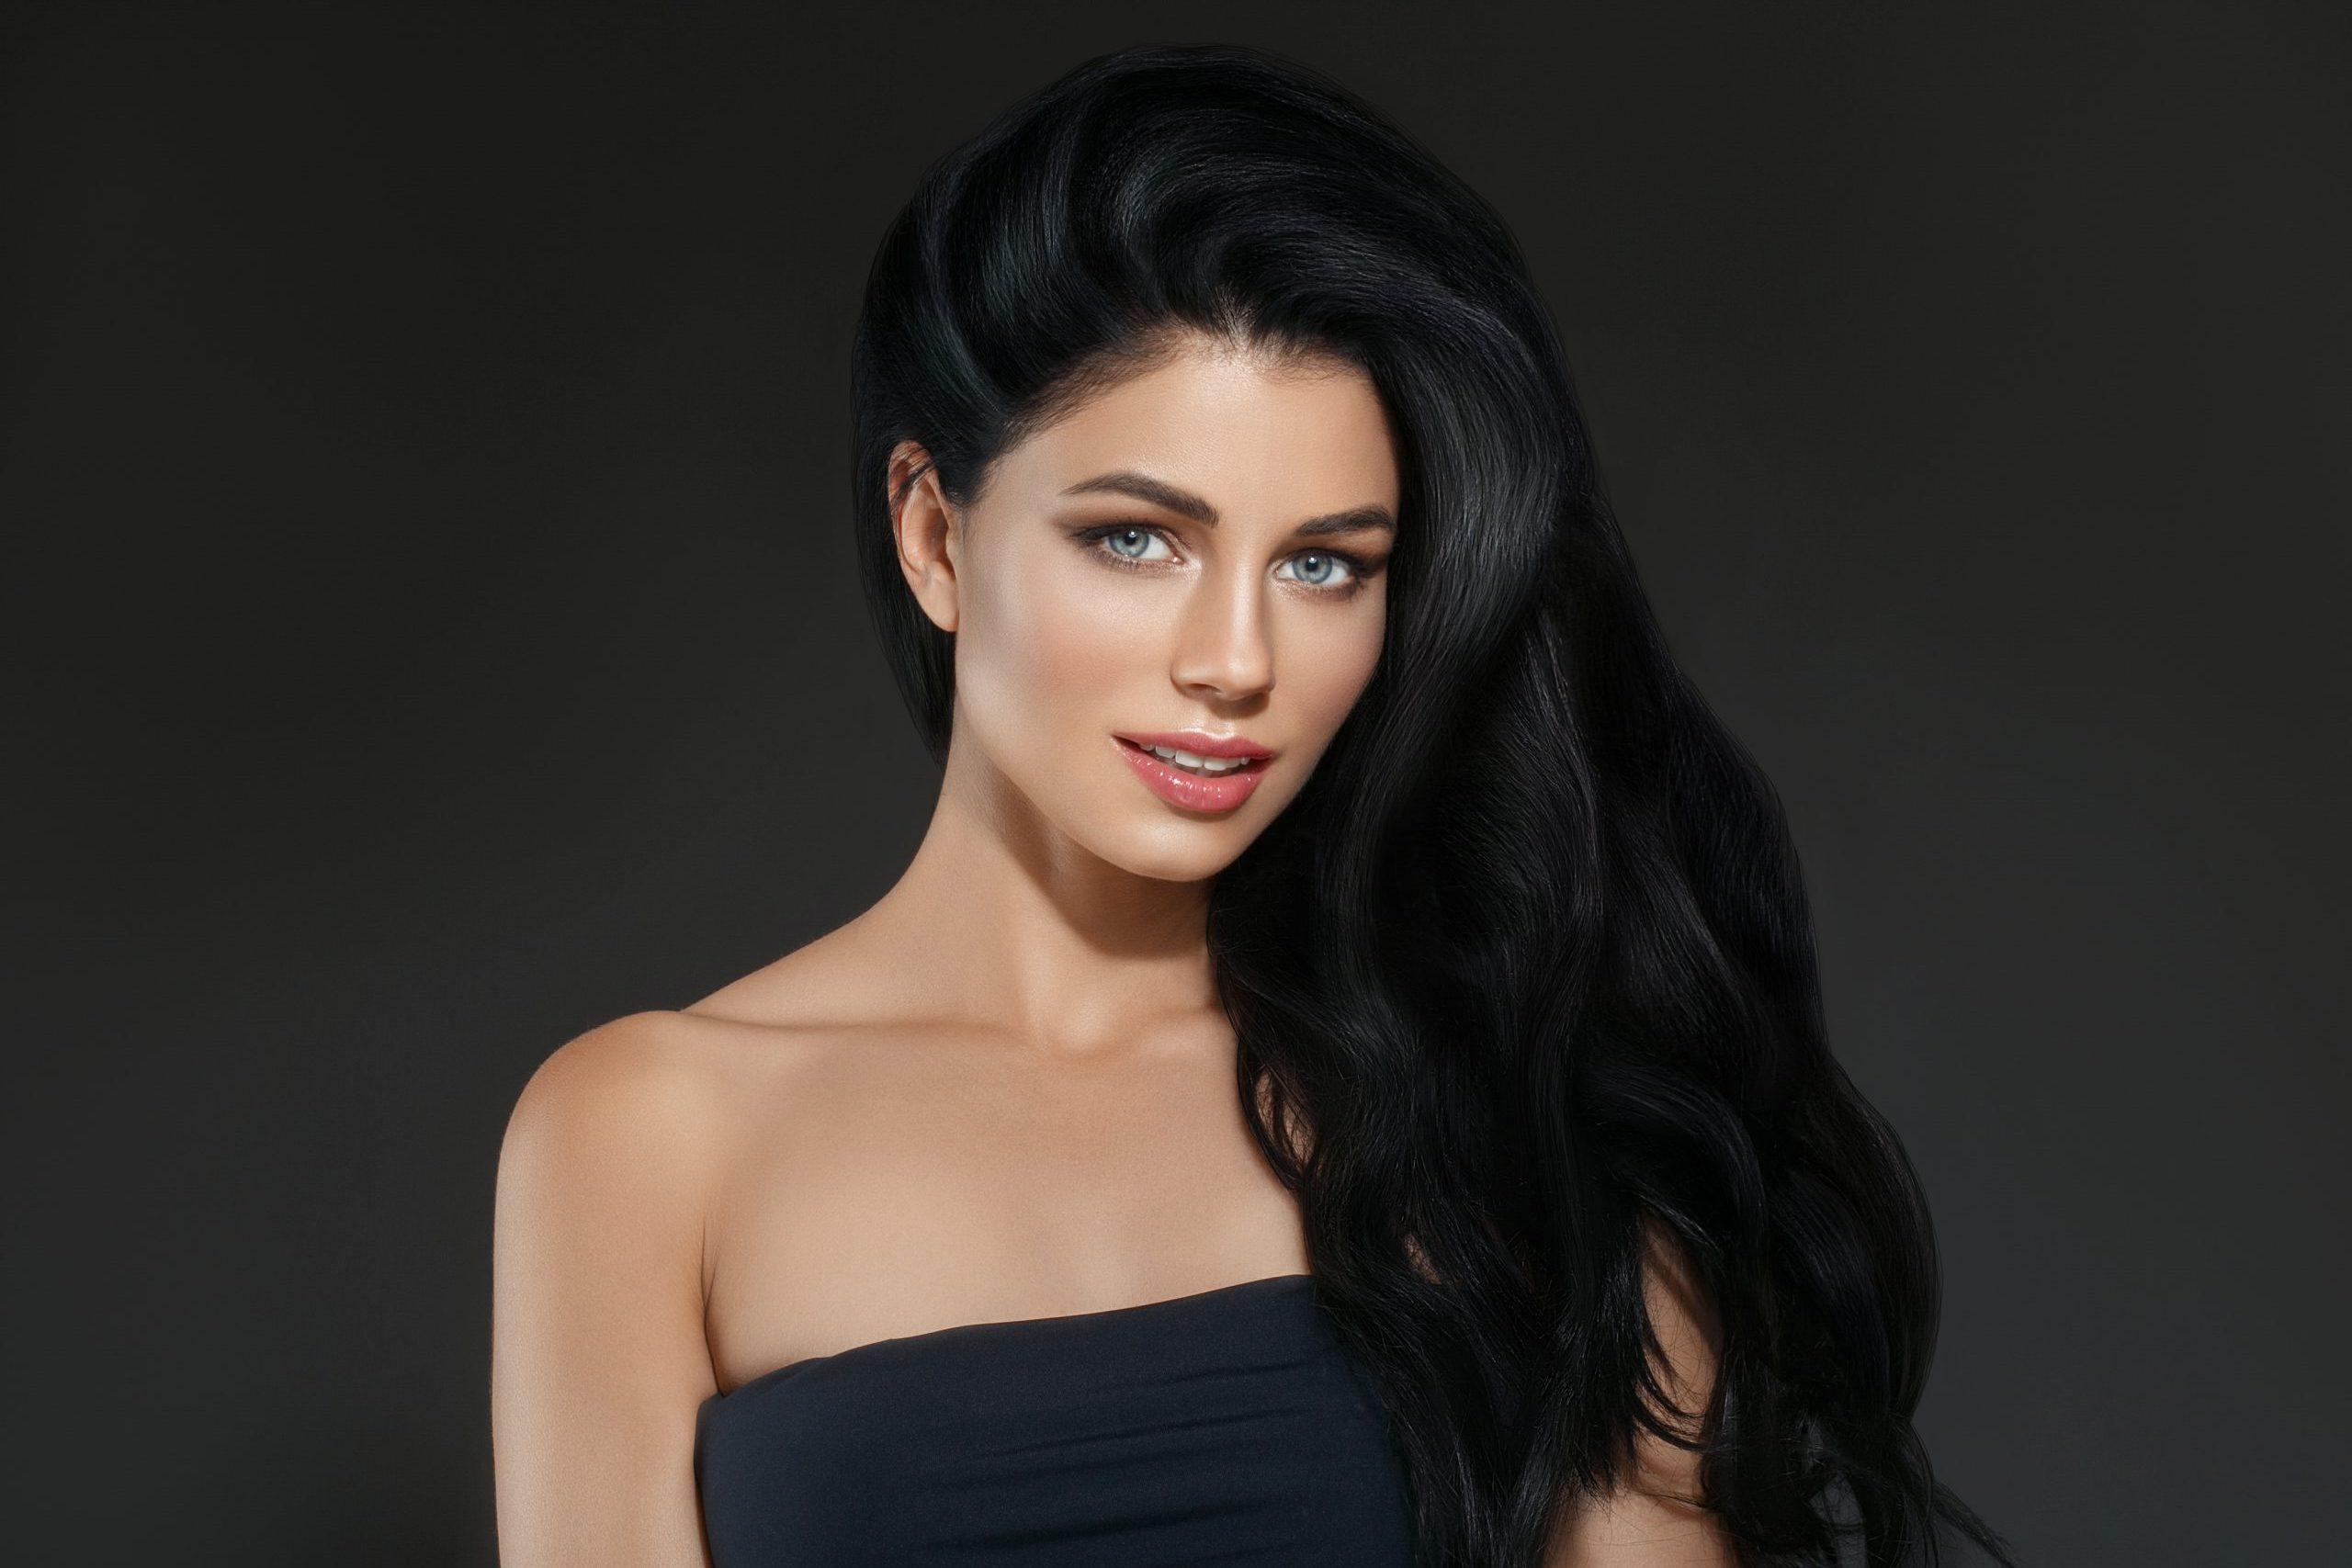 Black Hair Woman Beautiful Hairstyle Portrait